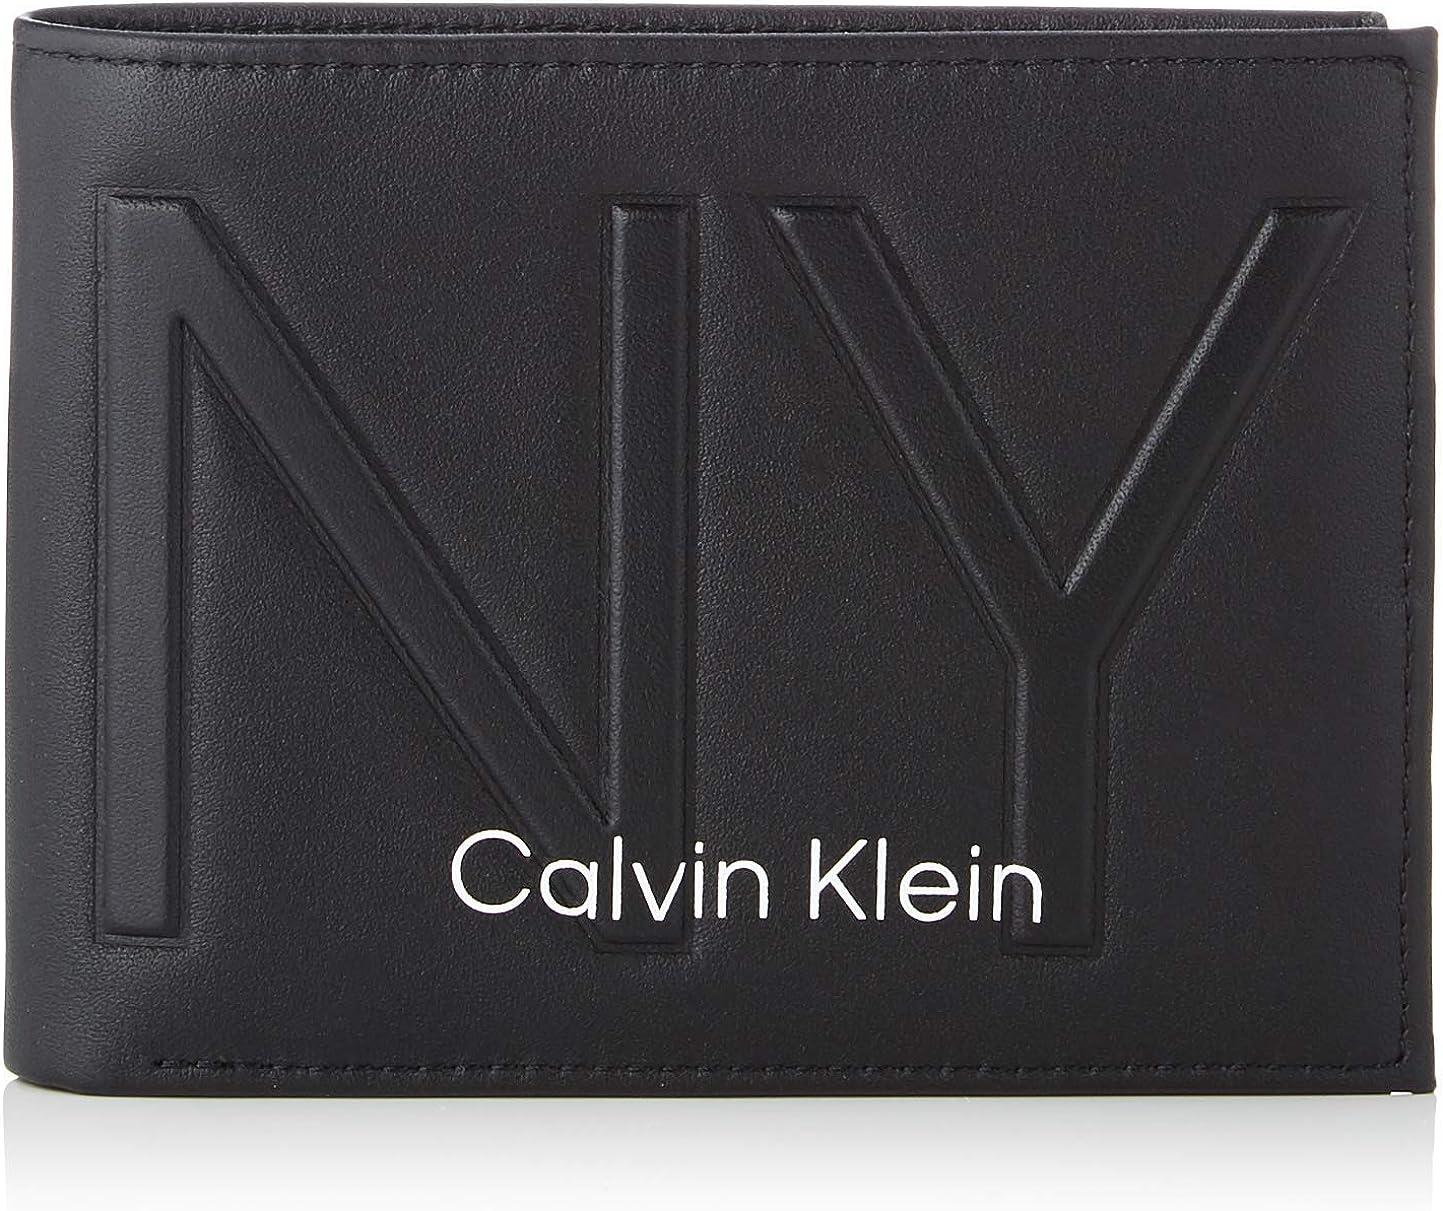 Calvin Klein - Shaped 5cc W/Coin, Carteras Hombre, Negro (Black), 0.1x0.1x0.1 cm (W x H L)